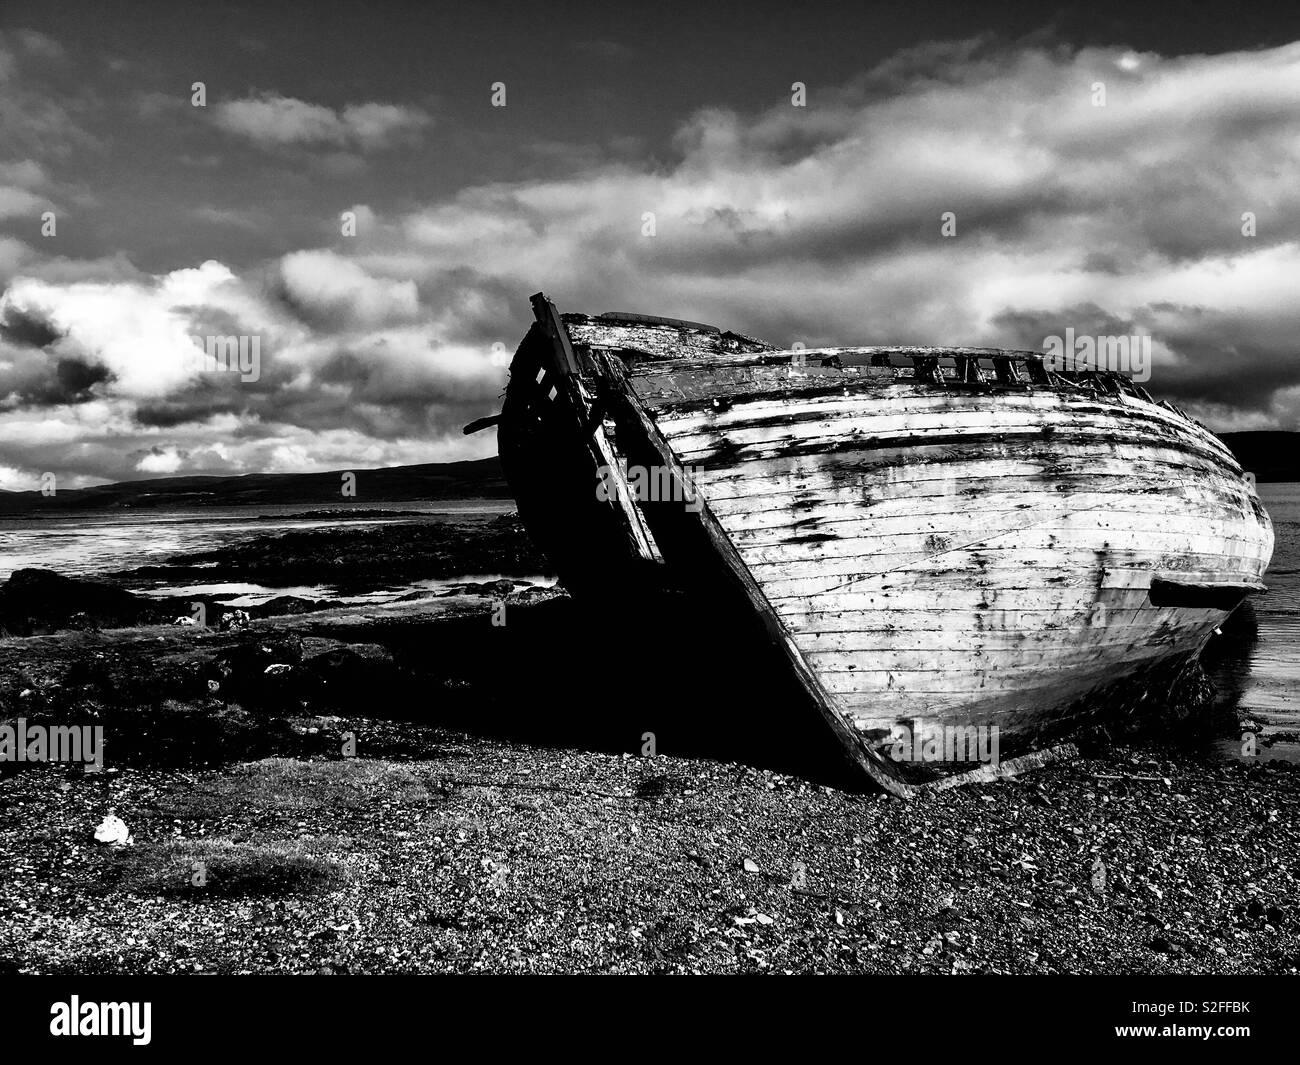 Derelict fishing boat, Salen, Isle of Mull Scotland - Stock Image